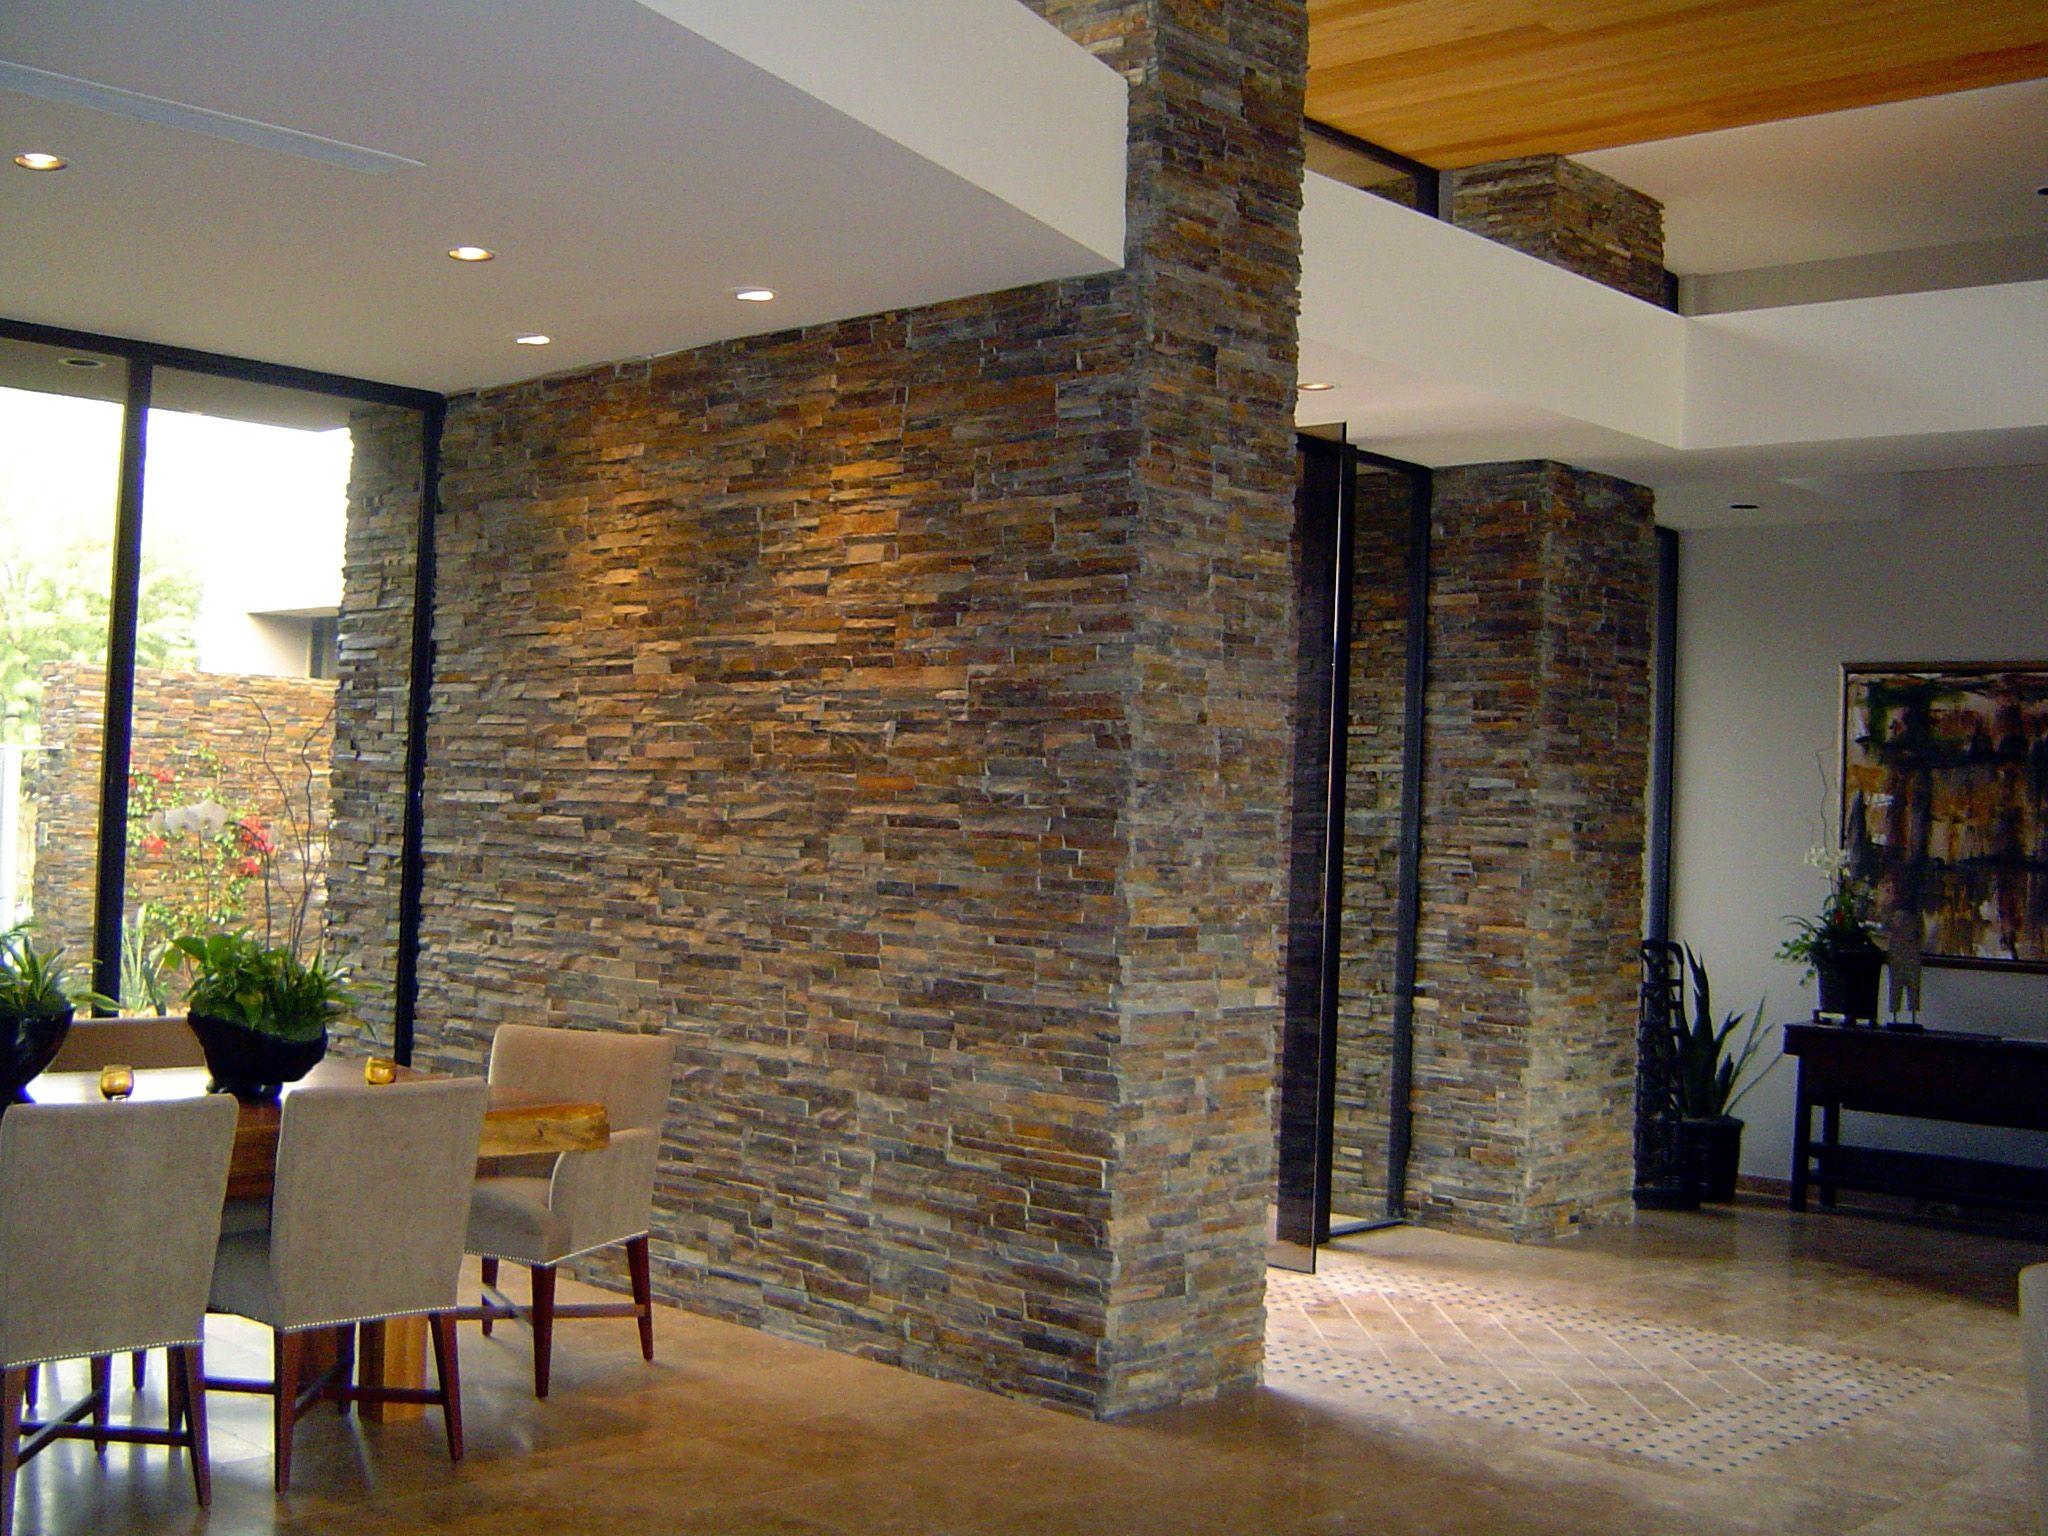 Estupendo sal n decorado con paneles premontados de piedra - Paneles piedra natural ...